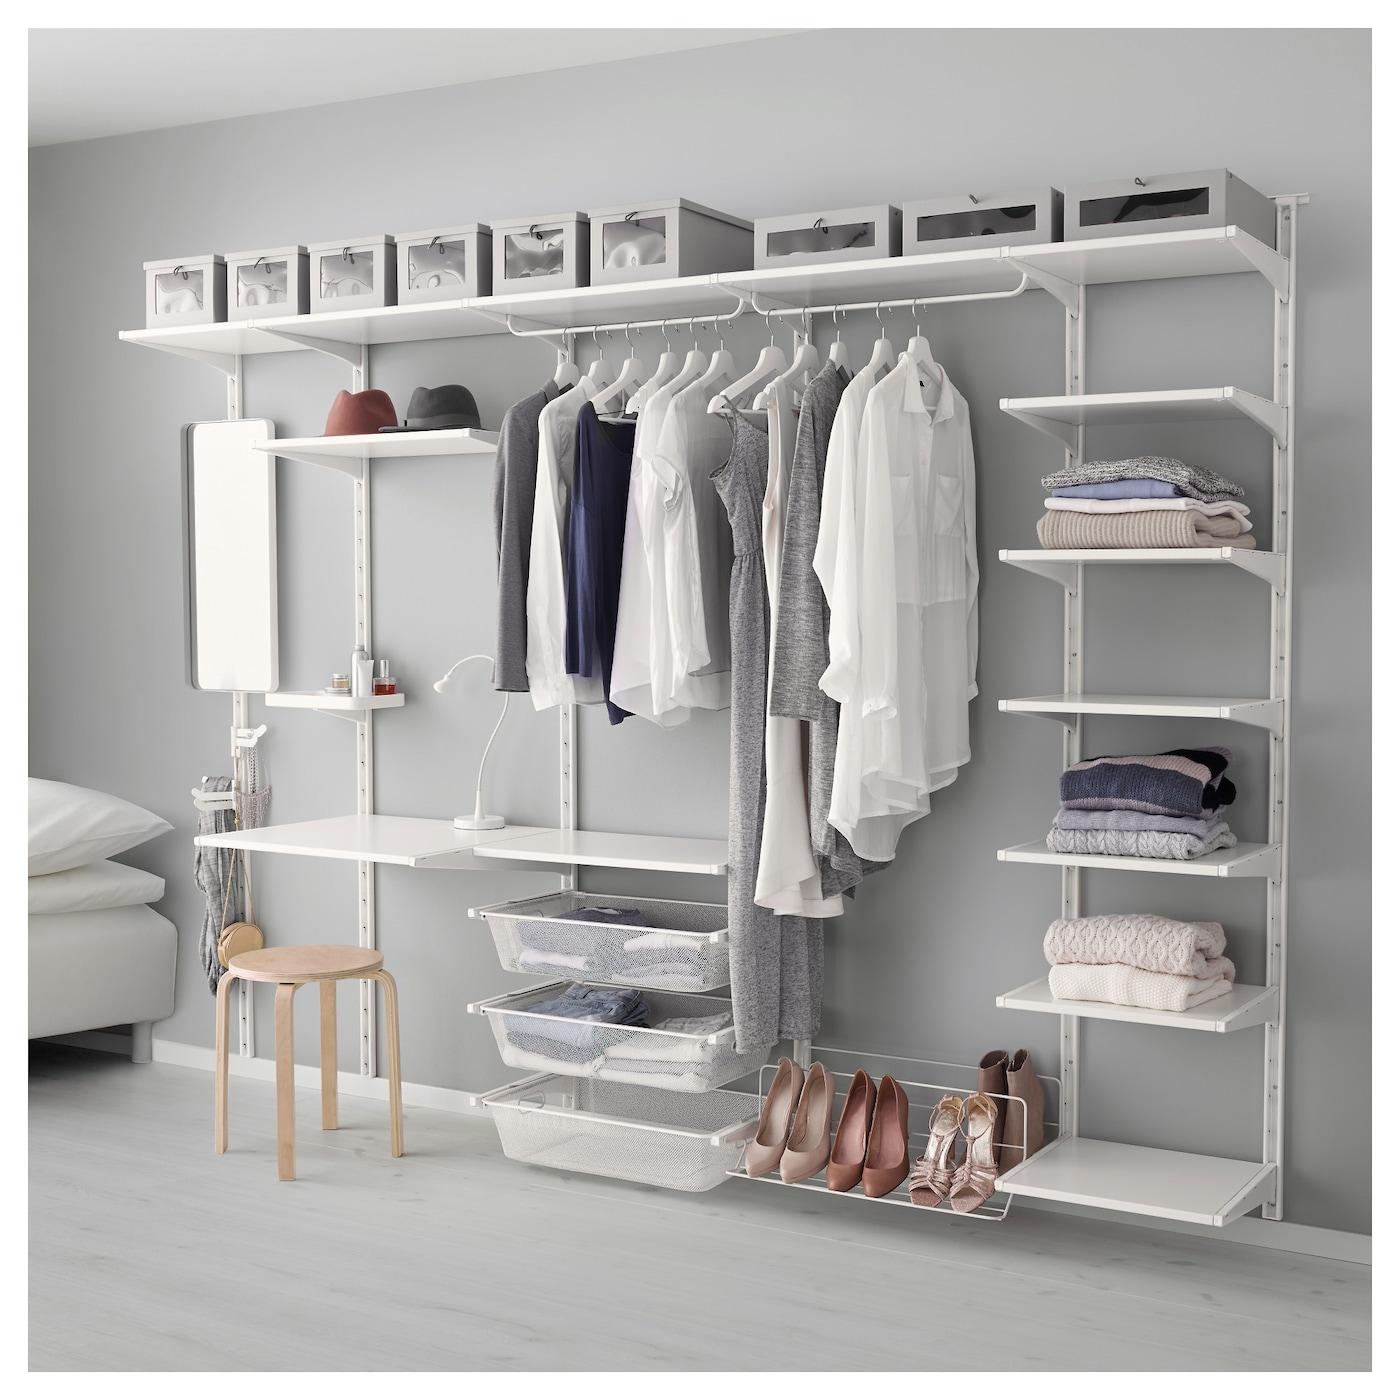 Algot Wall Upright Shelf Triple Hook White 278x41x199 Cm